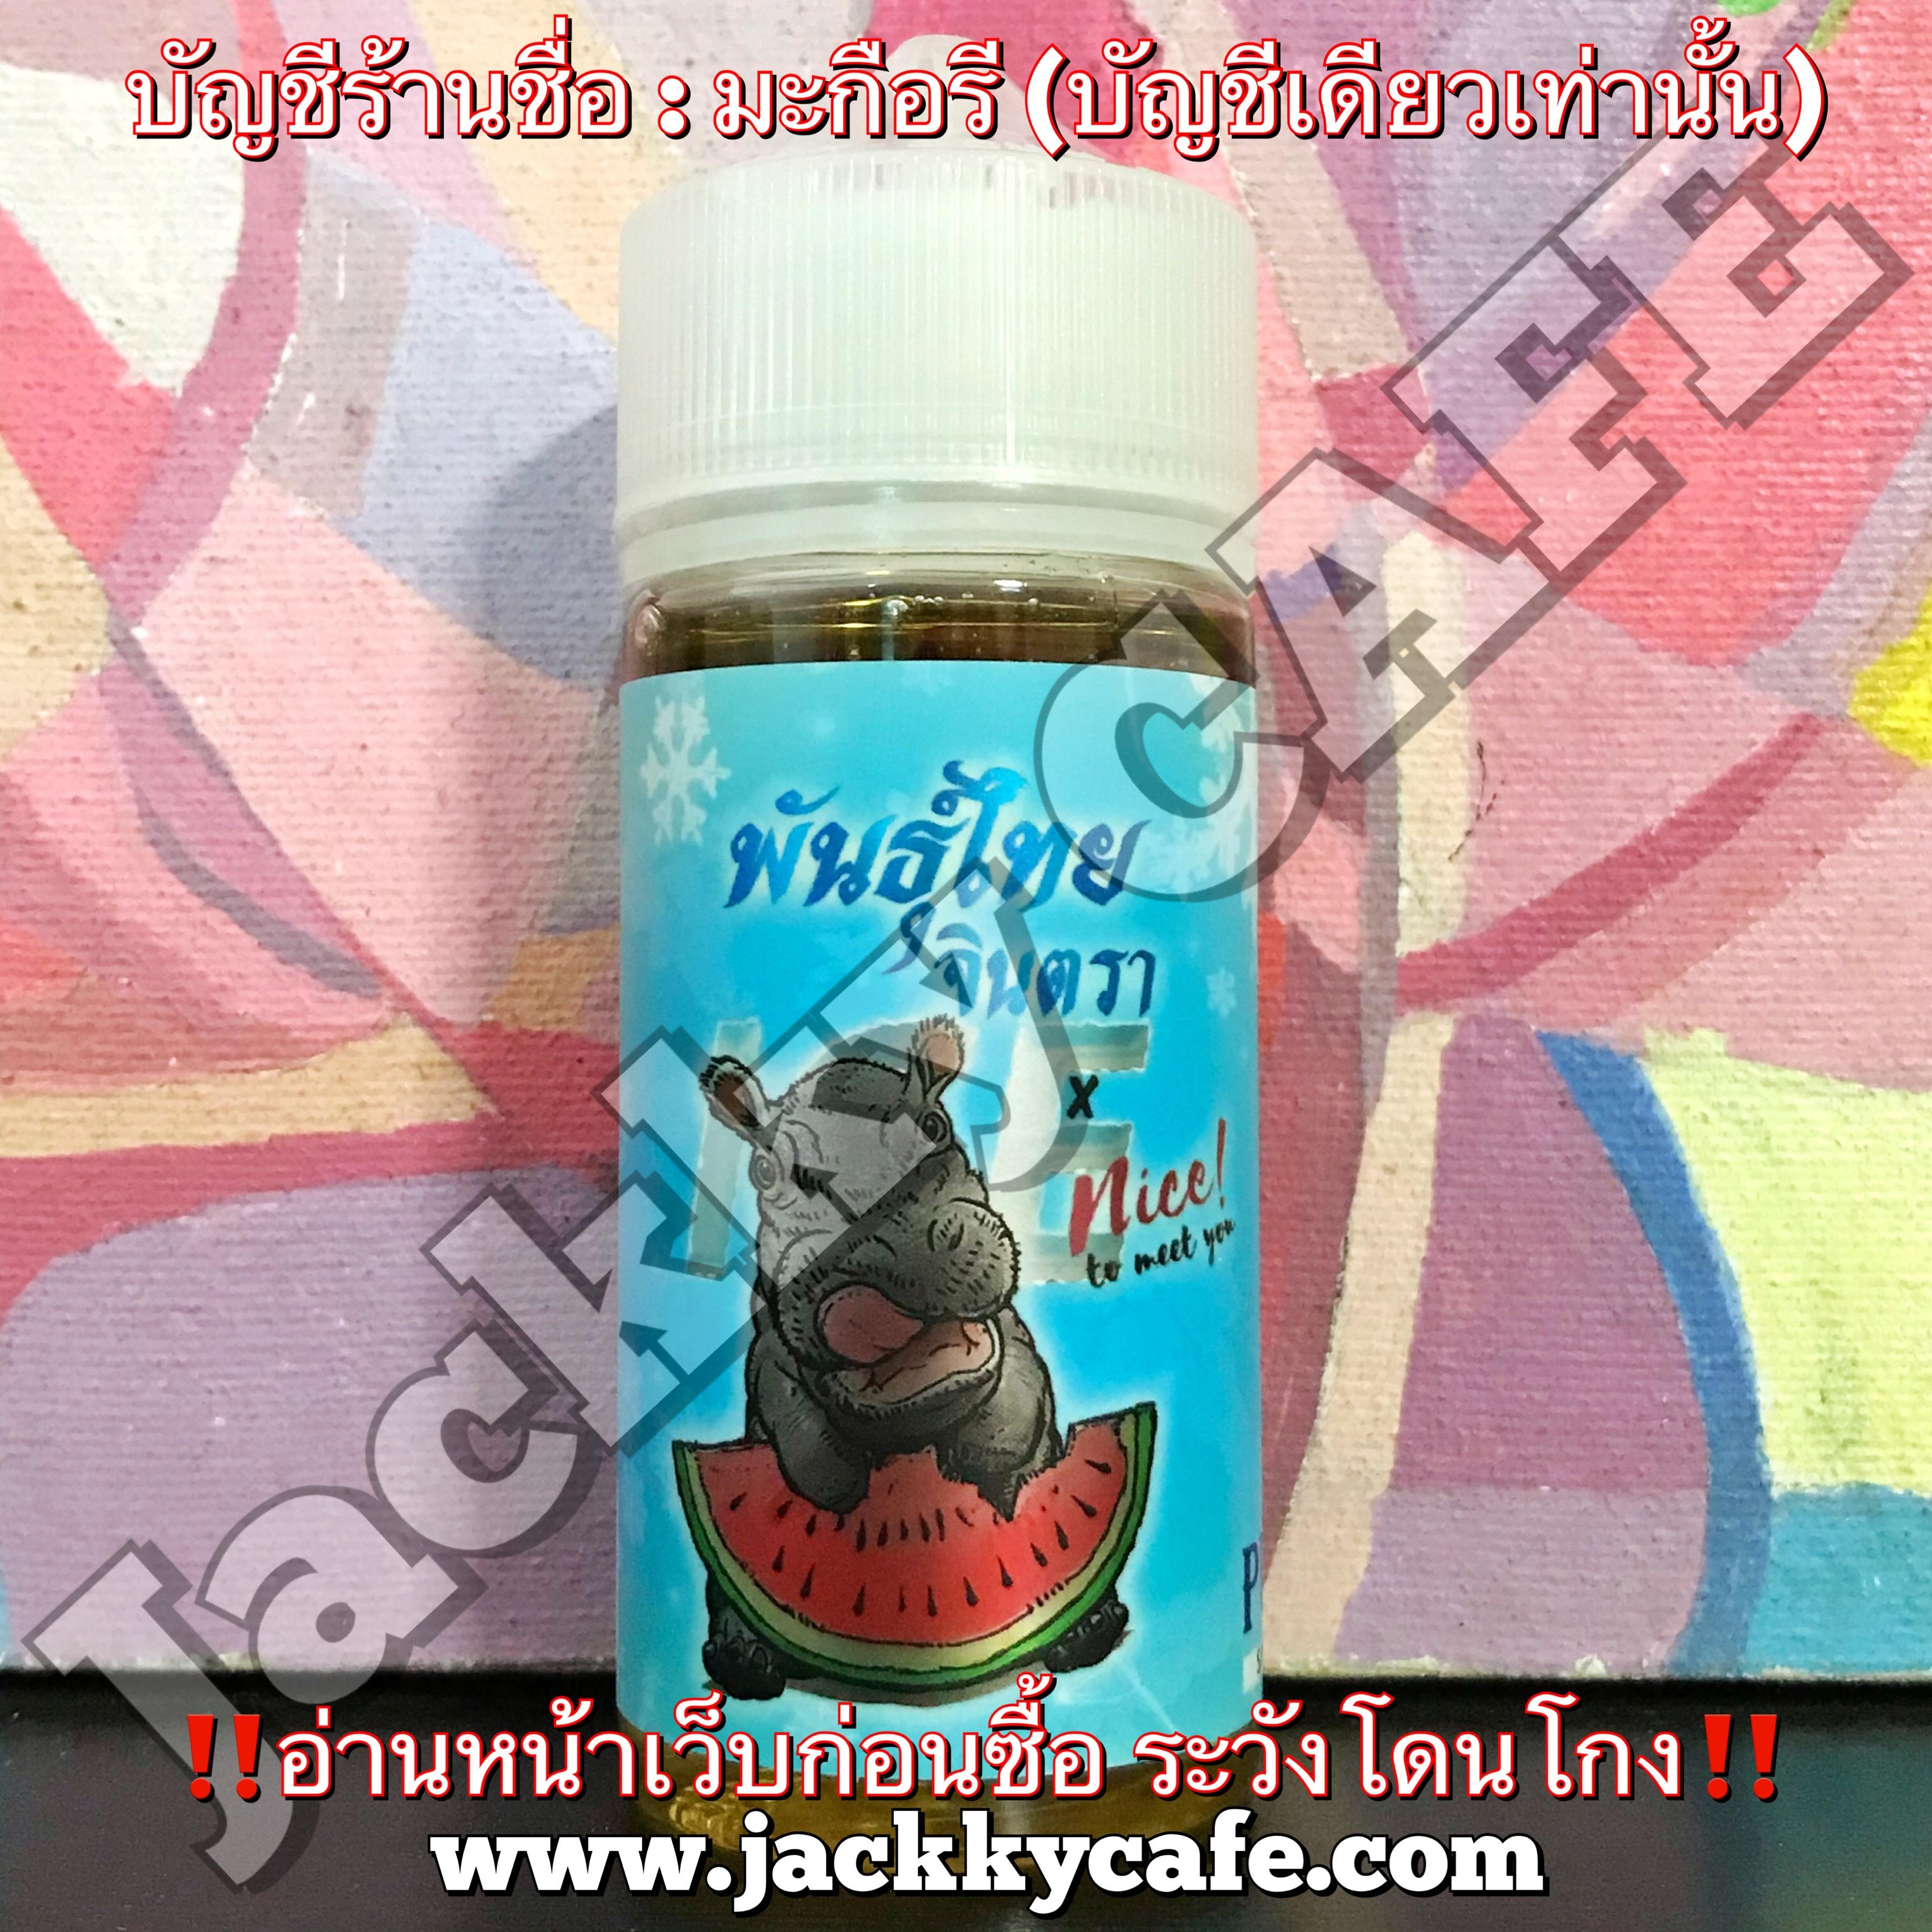 Punthai Watermelon Jintarha Ice Freebase (พันธุ์ไทยแตงโมจินตราไอซ์)